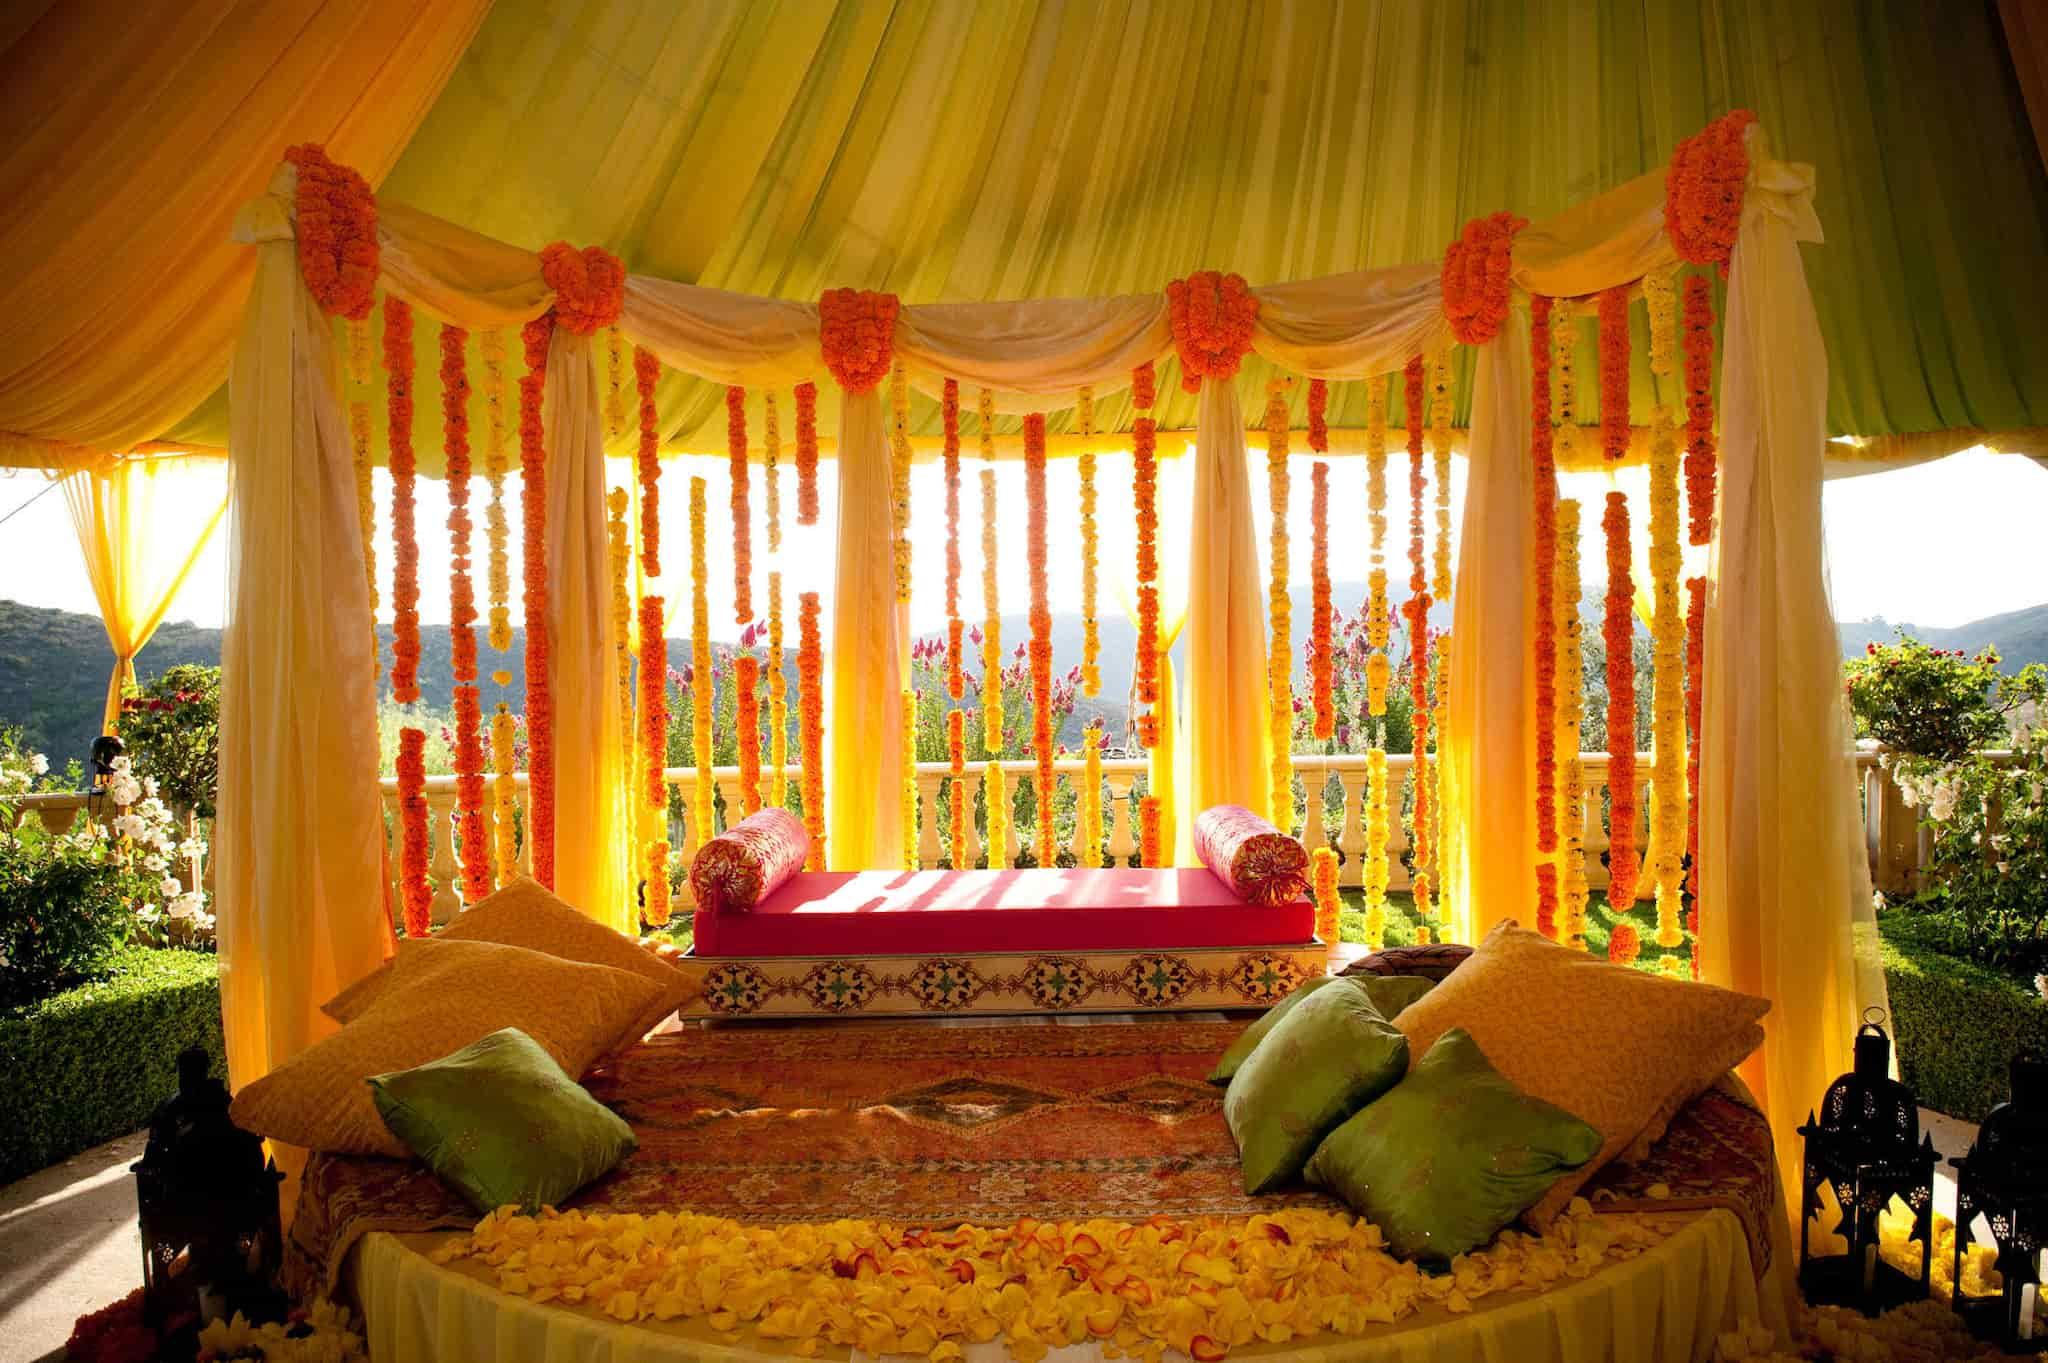 - Adeetya Caterers & Events Images, Sunder Nagar, Raipur-Chhattisgarh - Caterers